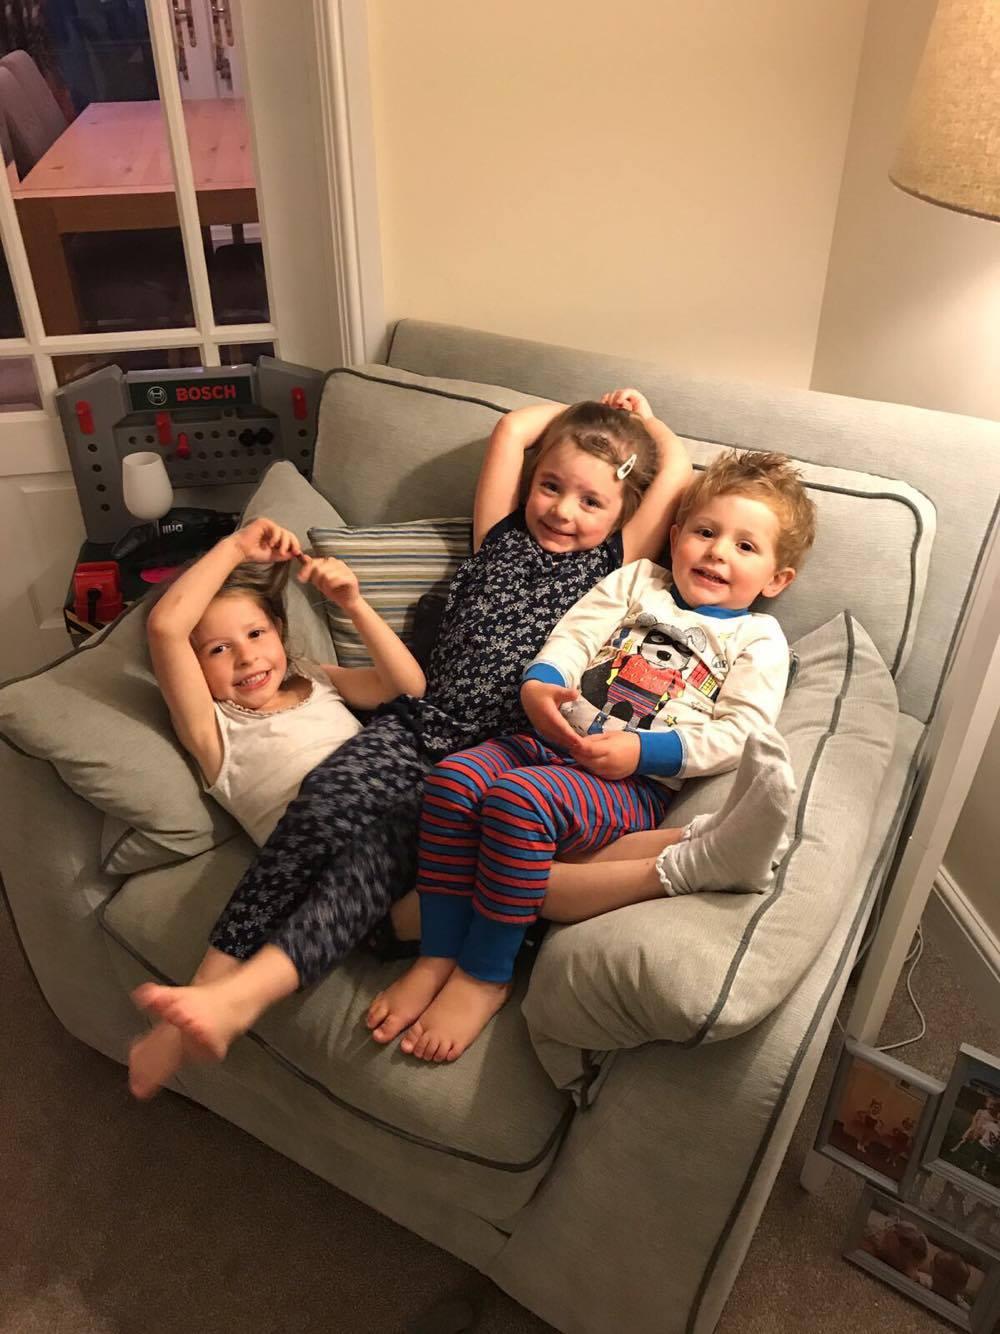 3 children sat on a chair